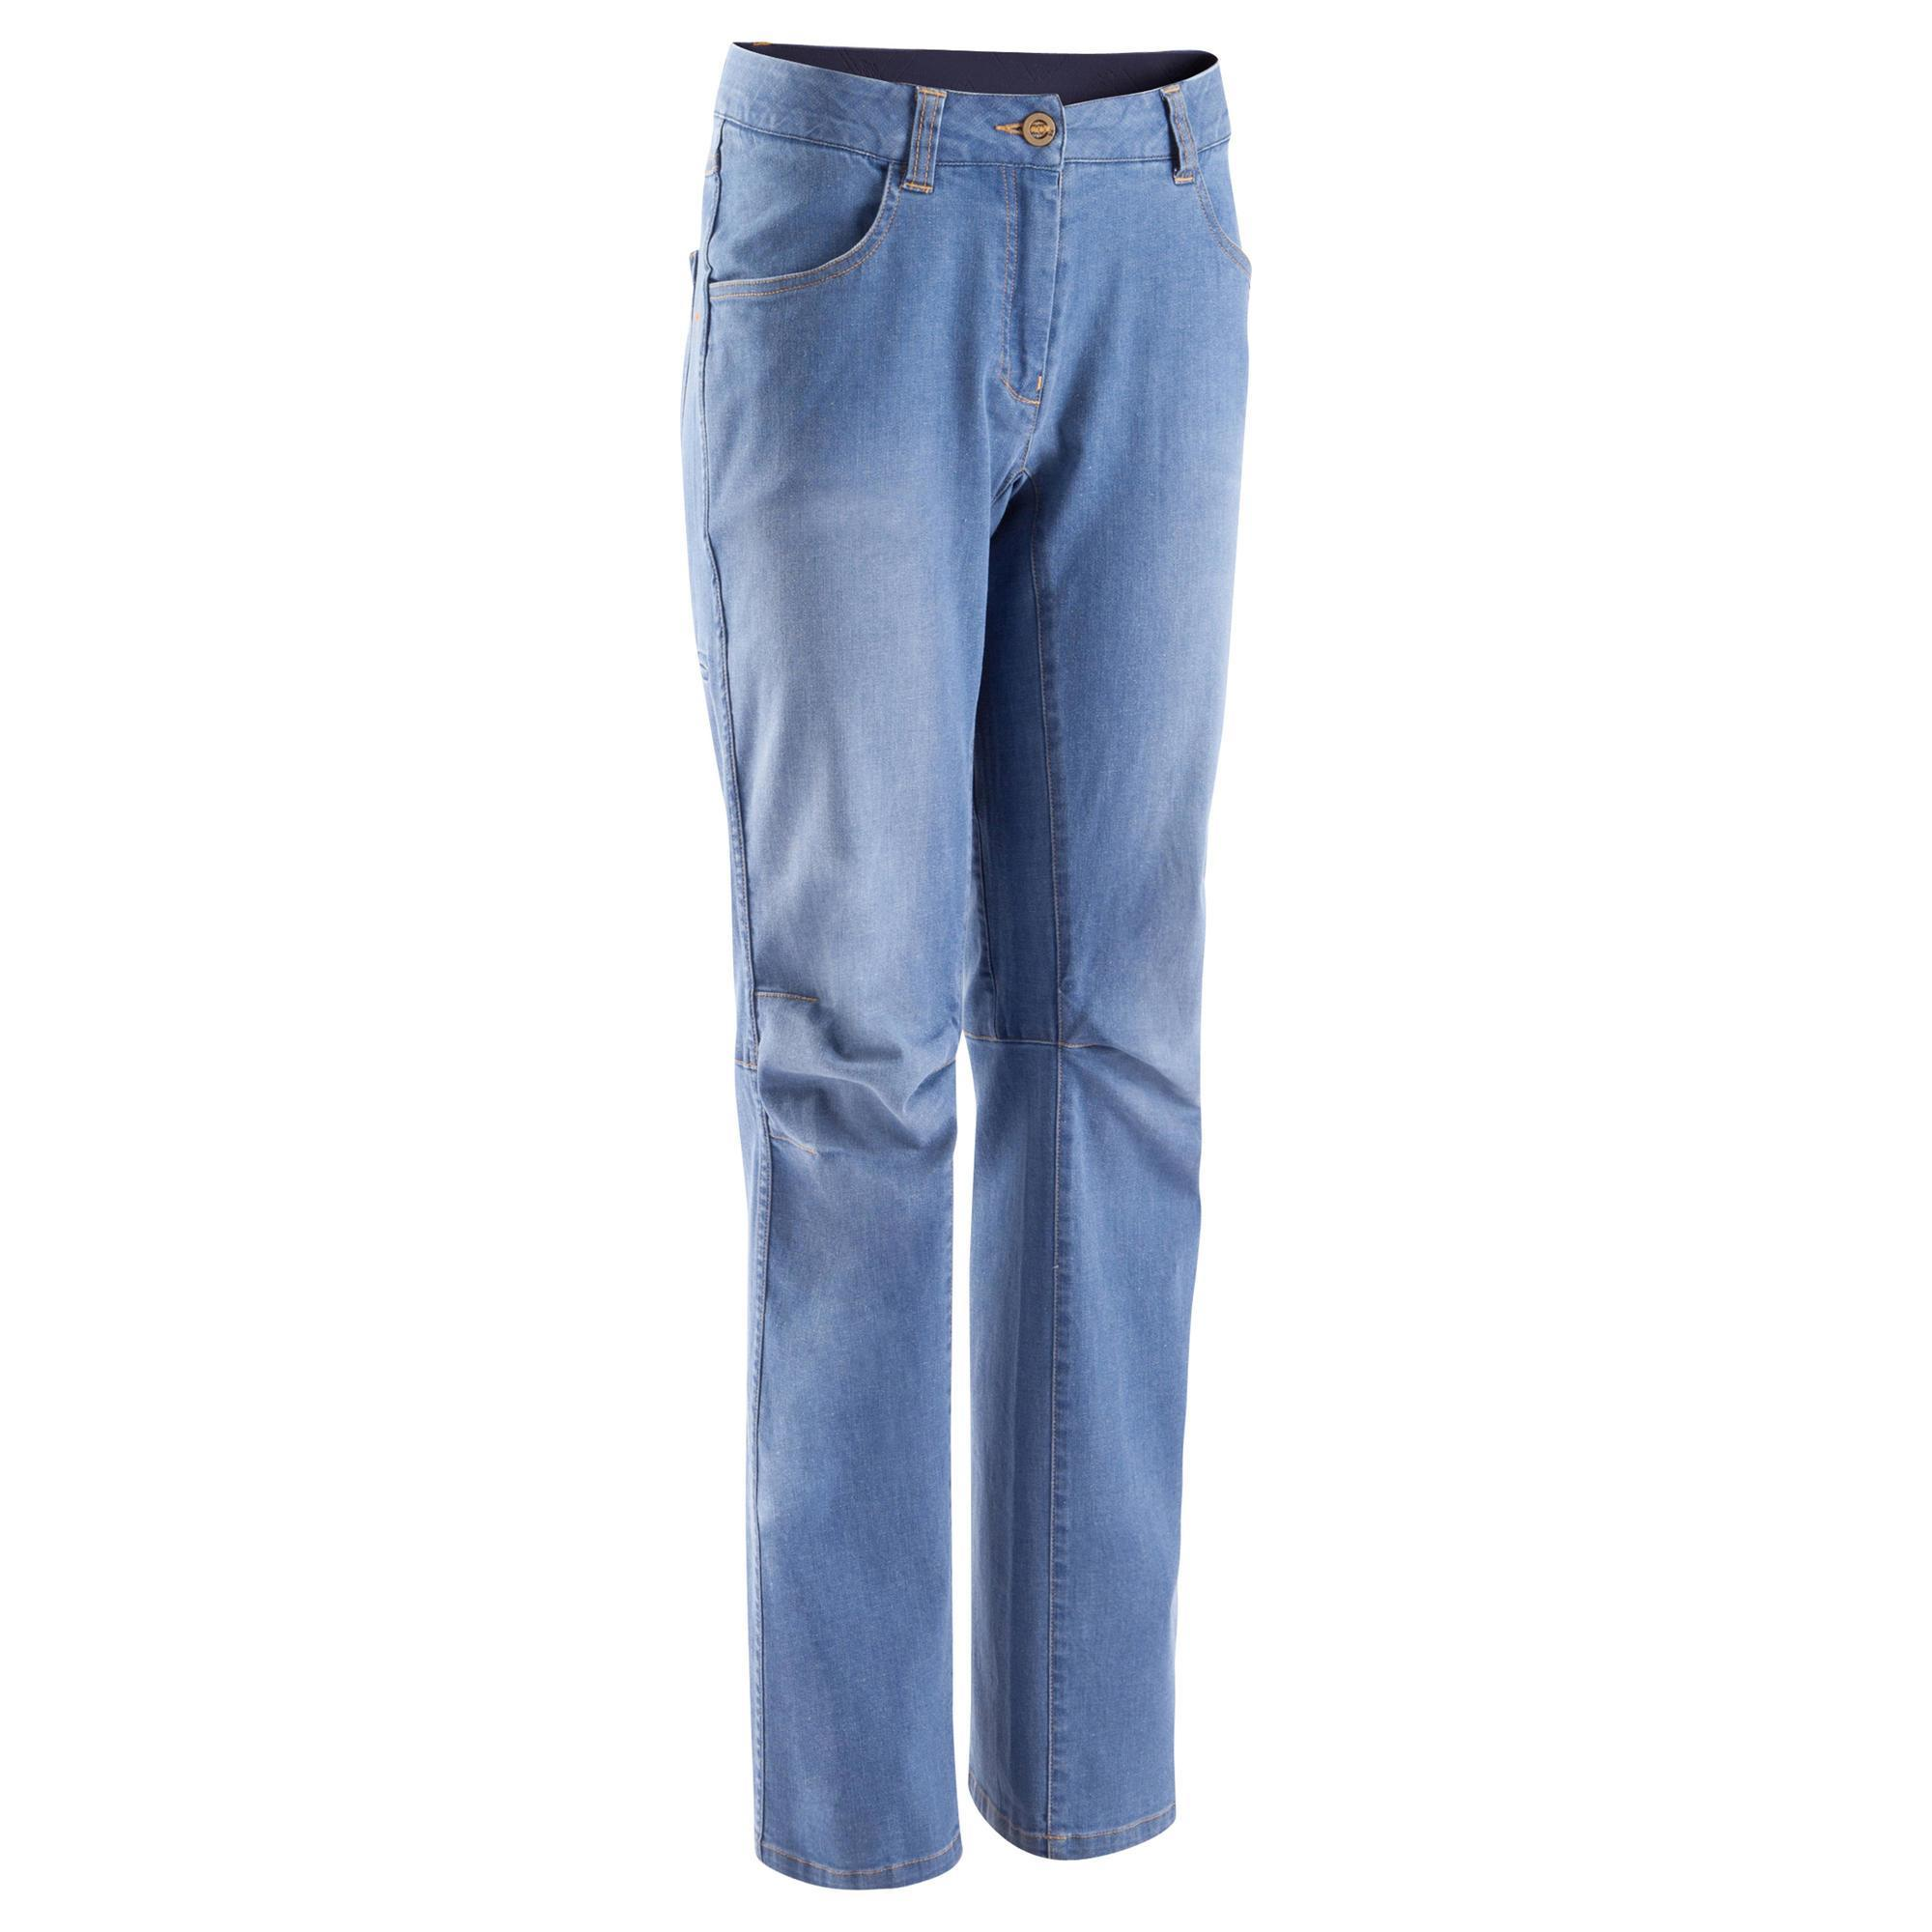 Damen Simond Kletterhose Jeans used Damen   03583788384557